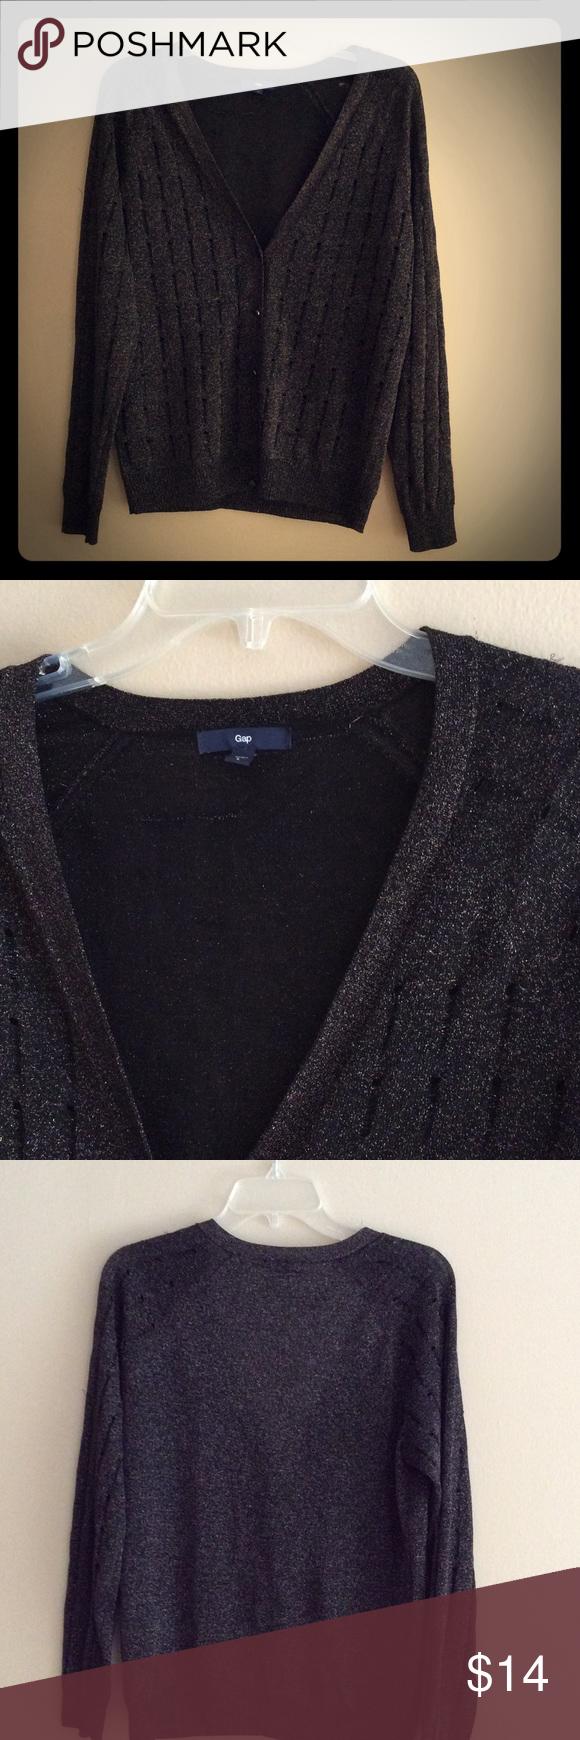 GAP Black with Gold threading cardigan sweater